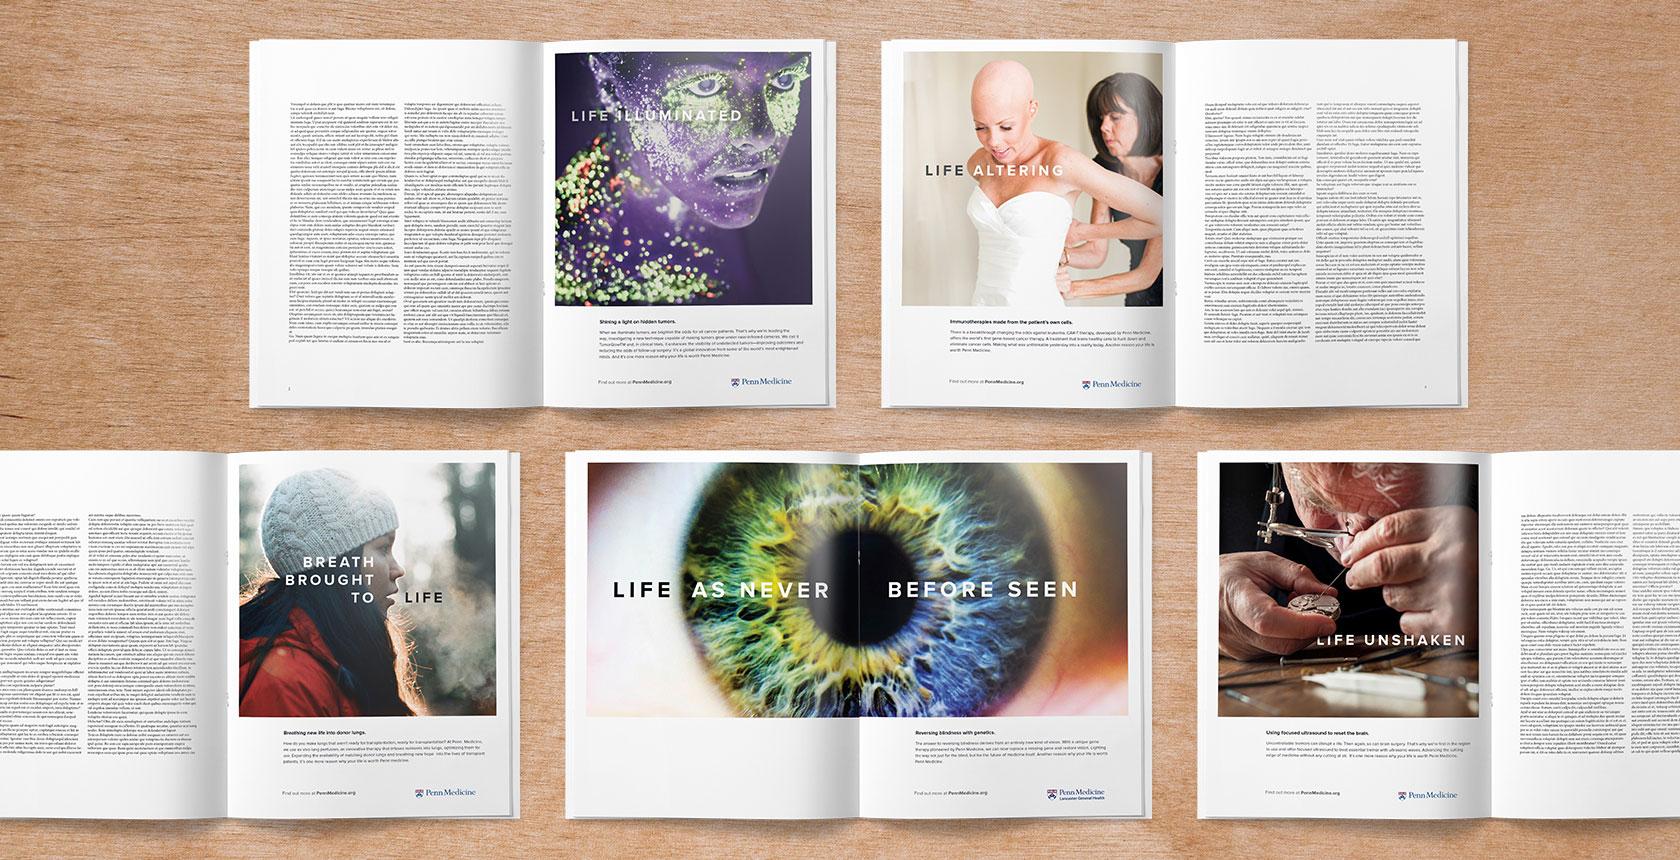 Brett_Ruiz_Penn_Medicine_Life_Print_Collection.jpg